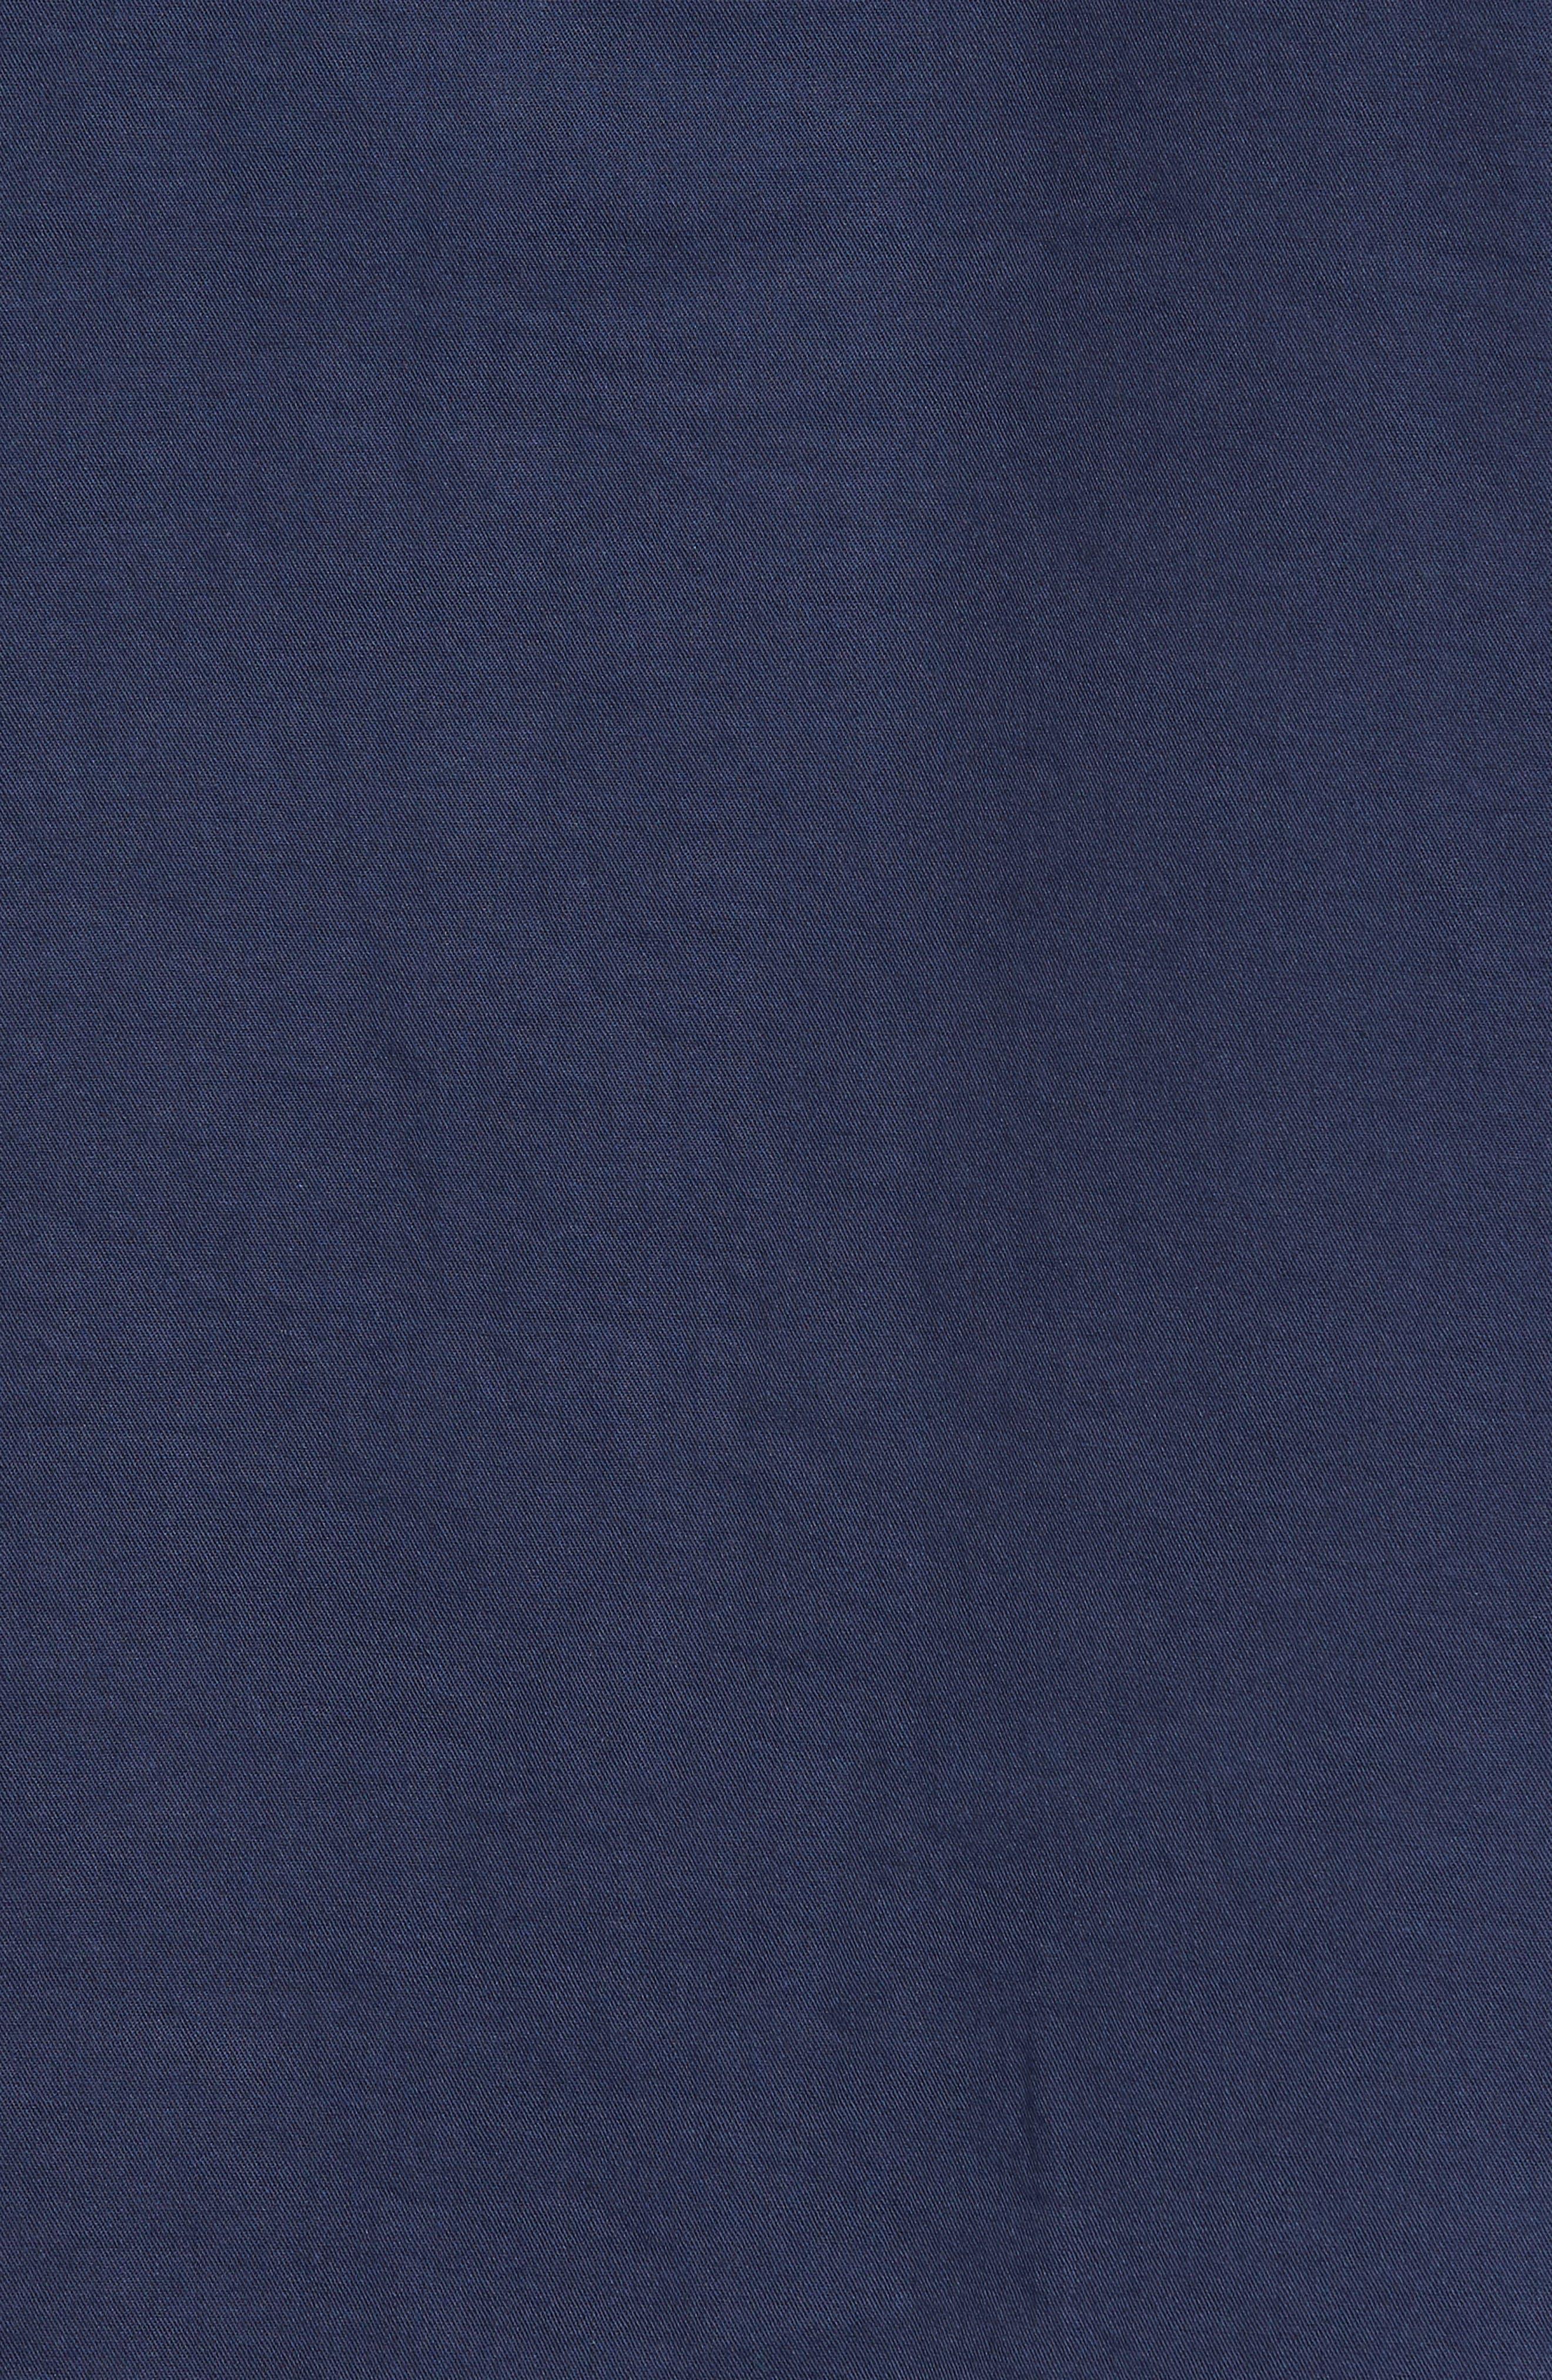 Blackstone Shirt Jacket,                             Alternate thumbnail 5, color,                             Navy